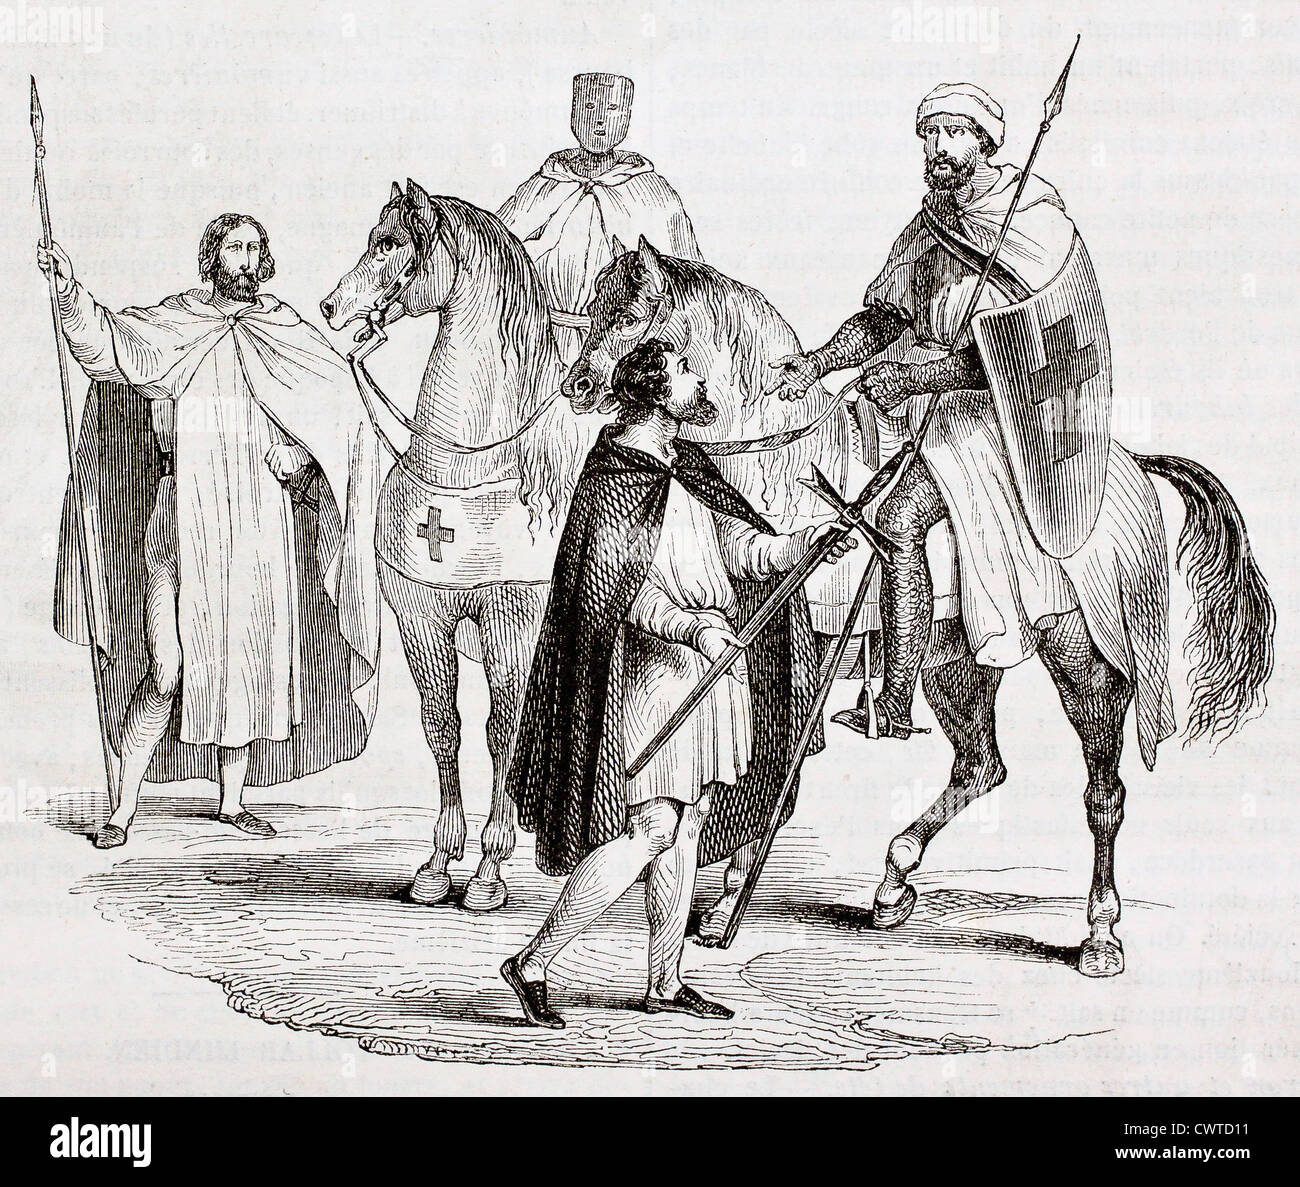 Knights Templar - Stock Image